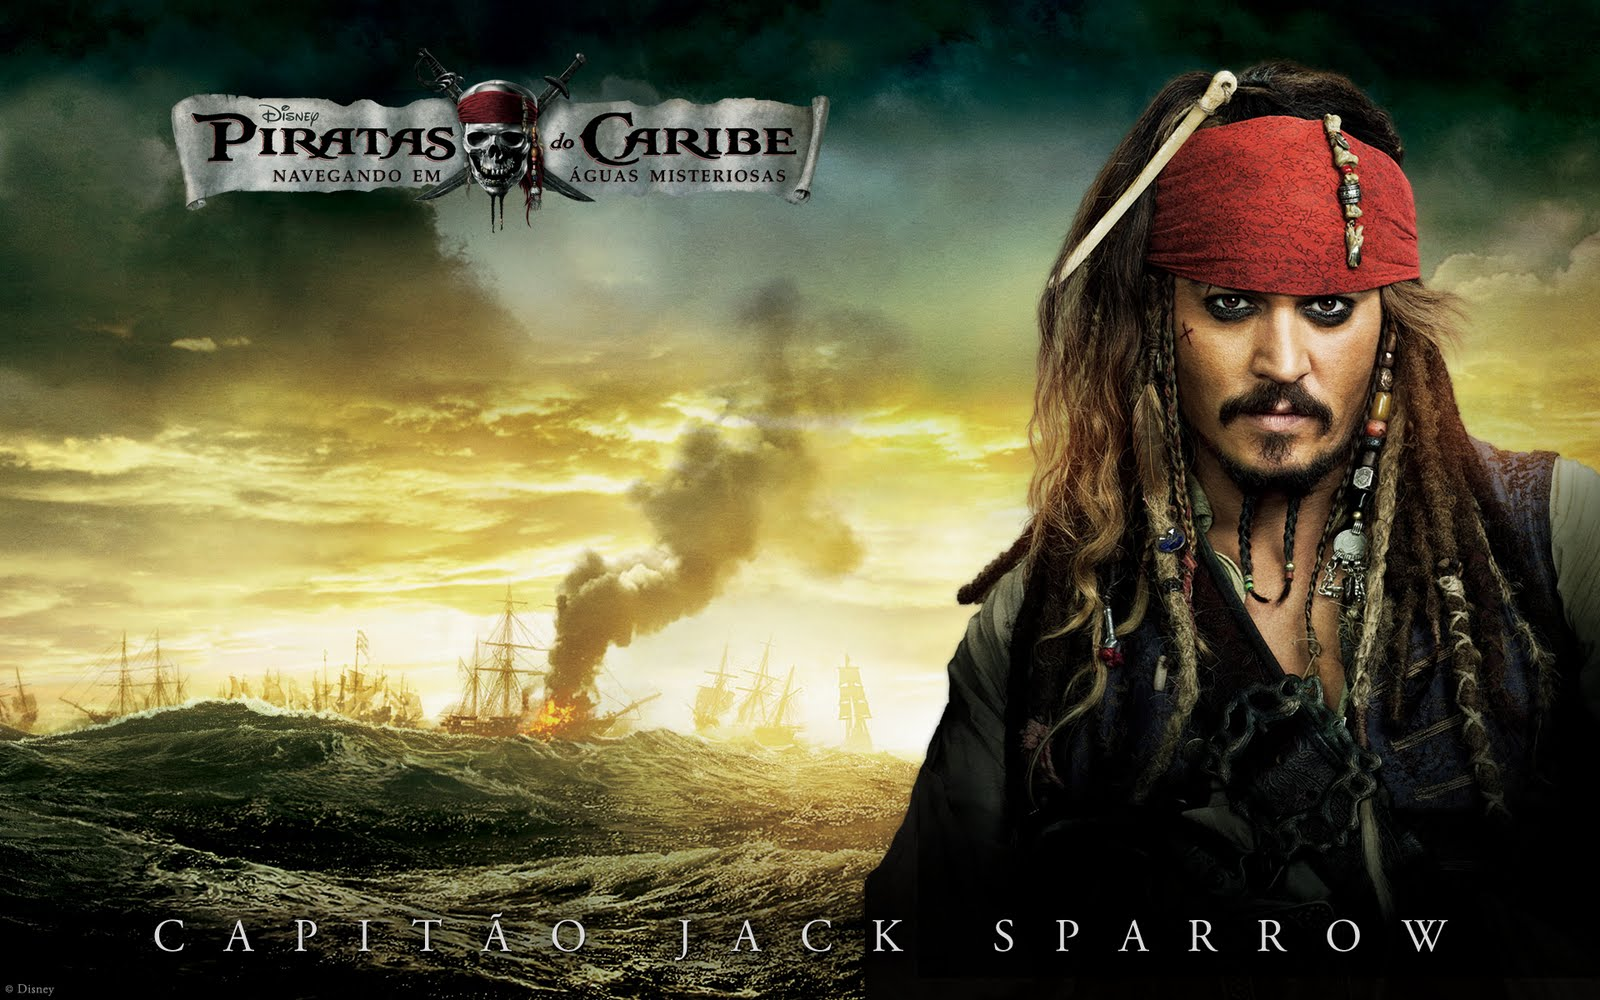 http://4.bp.blogspot.com/-5kUsRvnsHSY/TjCFCawUvEI/AAAAAAAADHc/uA1SYfnjHPc/s1600/piratasdocaribe_pc4_wallpaper-jack-sparrow-1920x1200.jpg